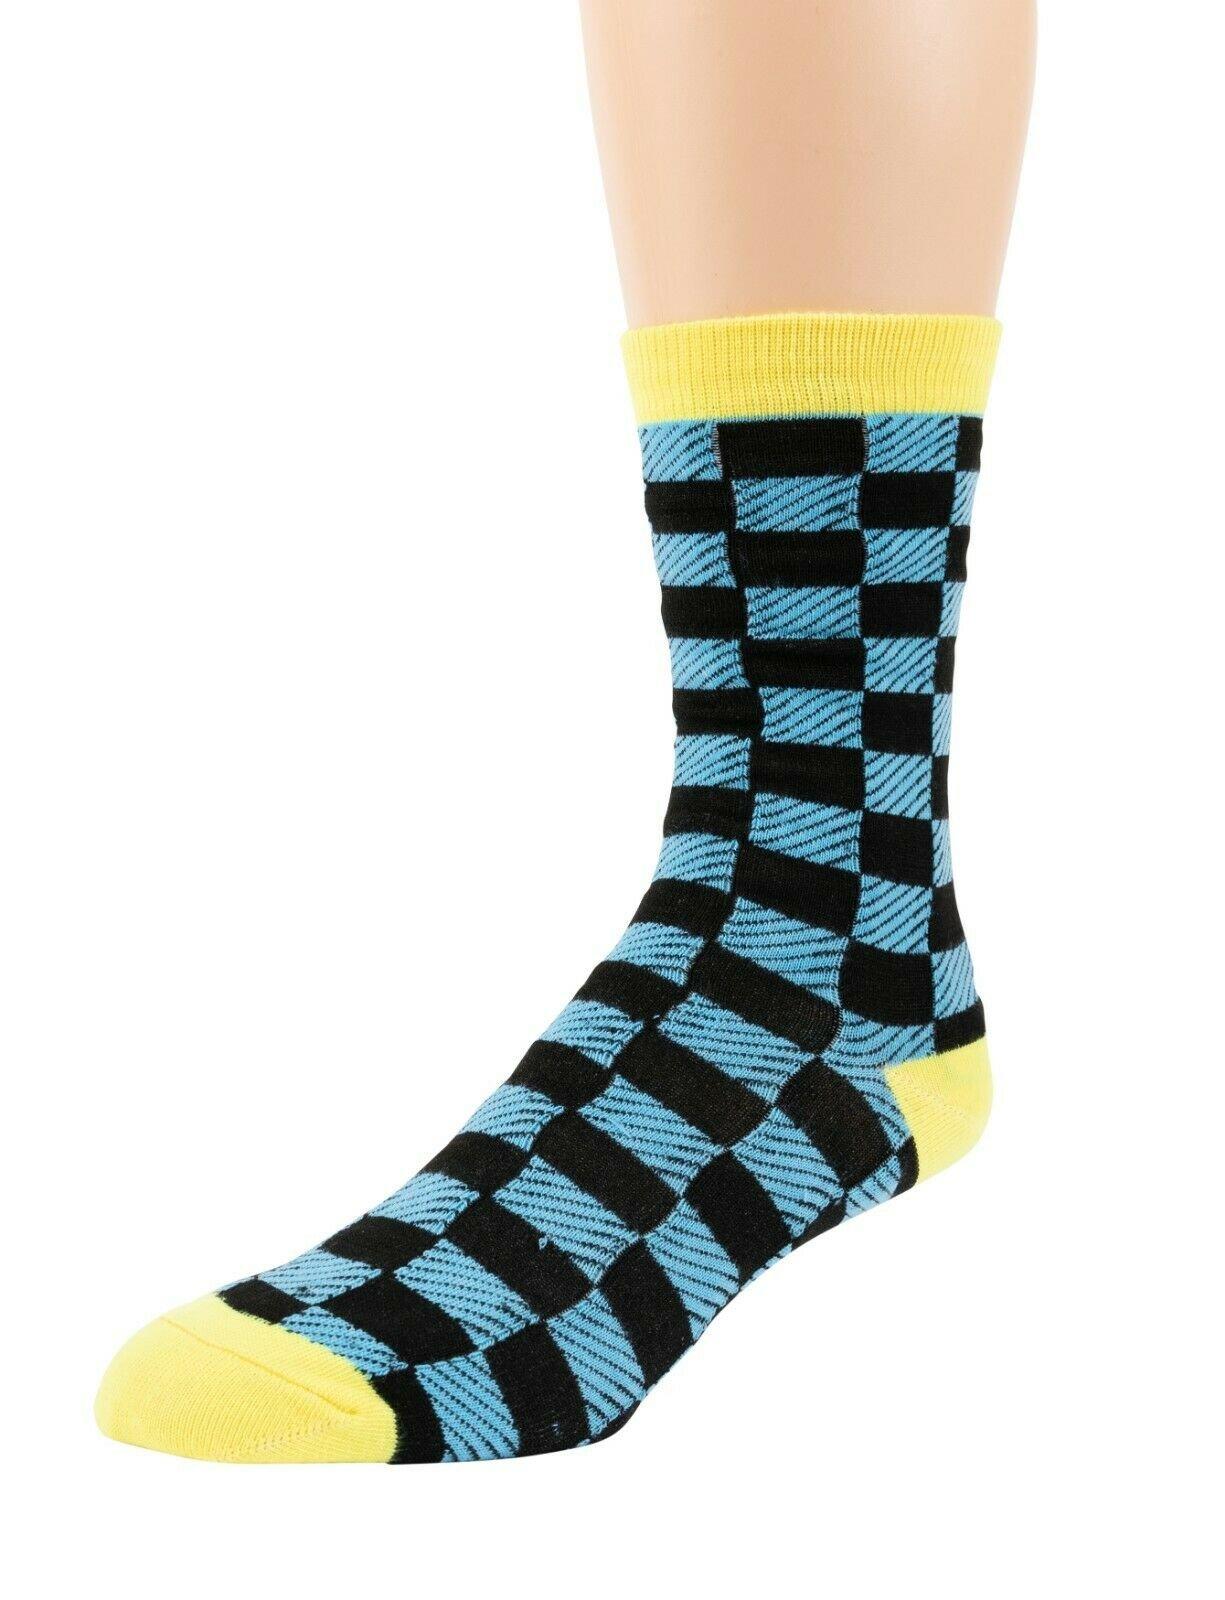 Mitch-Bogen-Mens-Cotton-Dress-Socks-Colorful-Fashion-Crew-Socks-8-Pack-Gift-Box thumbnail 62